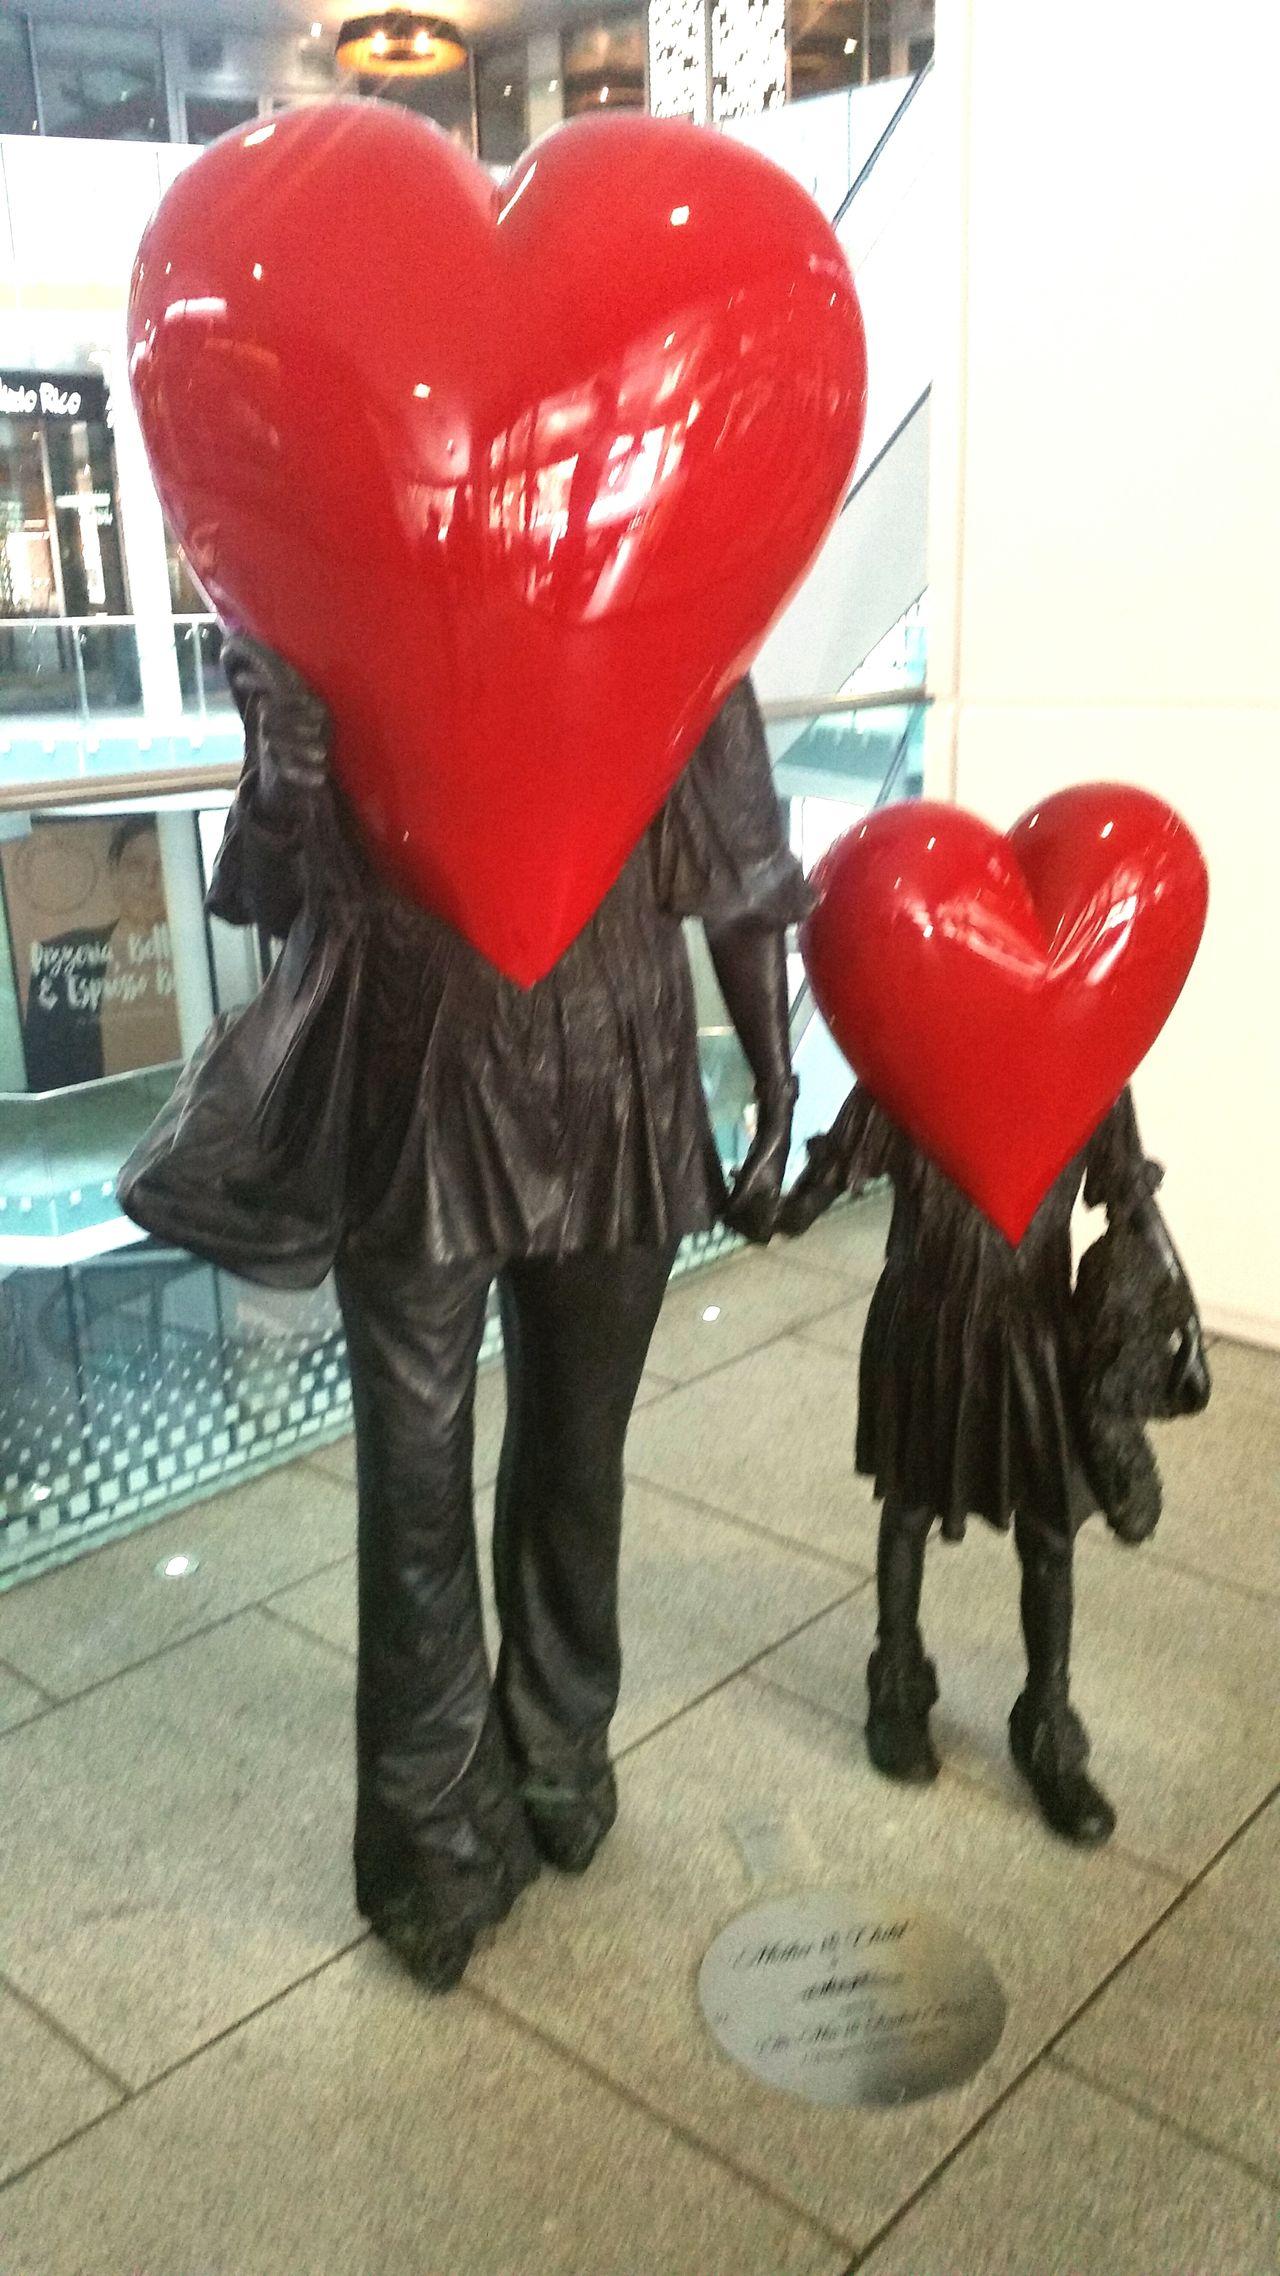 Indoors  Heart Shape Red Love Child Adult Statue Art Is Everywhere Art The Cube Birmingham UK Birmingham Uk Girl Woman Motherlove